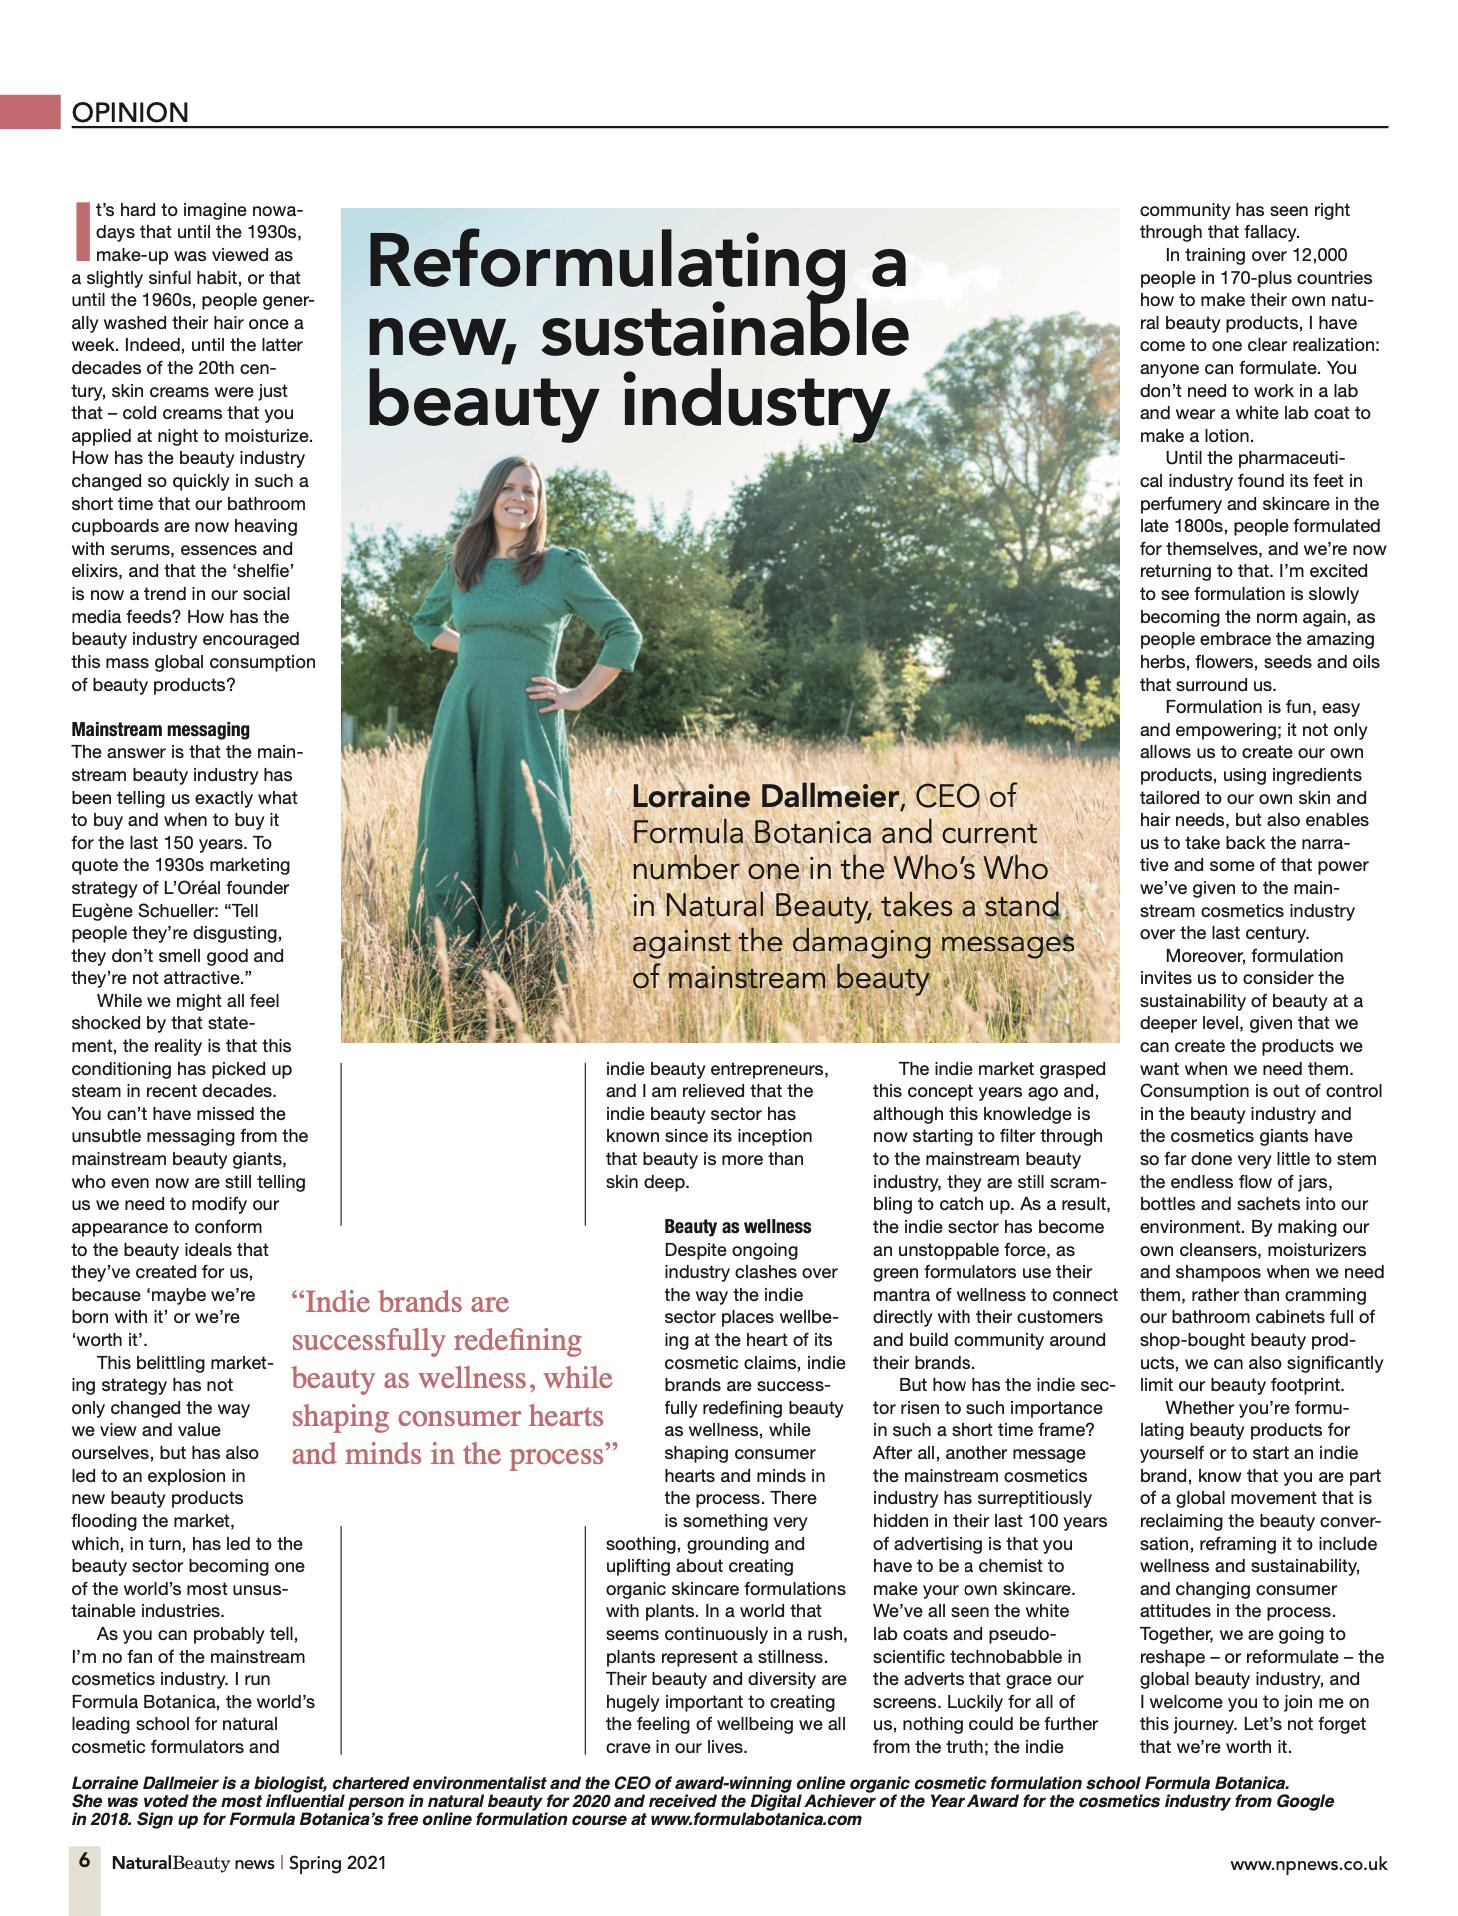 Lorraine Dallmeier Media Interview - Natural Beauty News